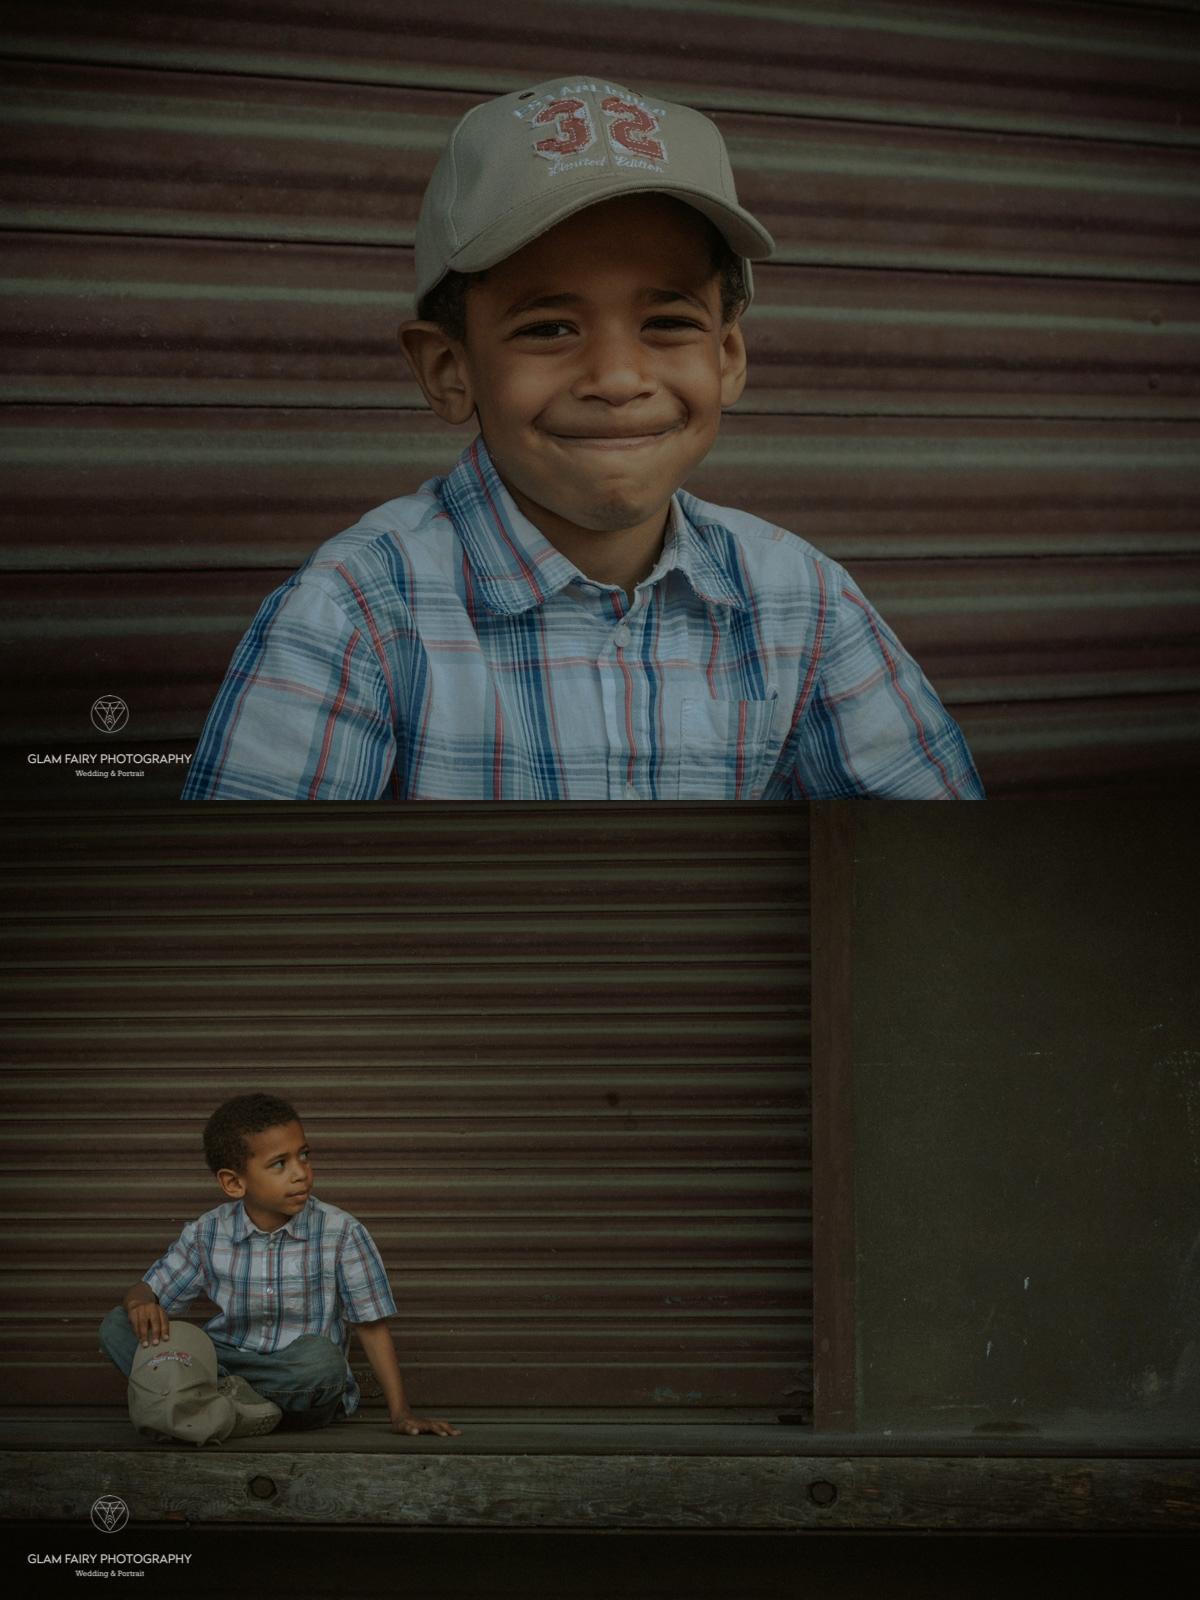 GlamFairyPhotography-photographe-seance-enfant-american vintage-alfortville-Nathan_0001.jpg